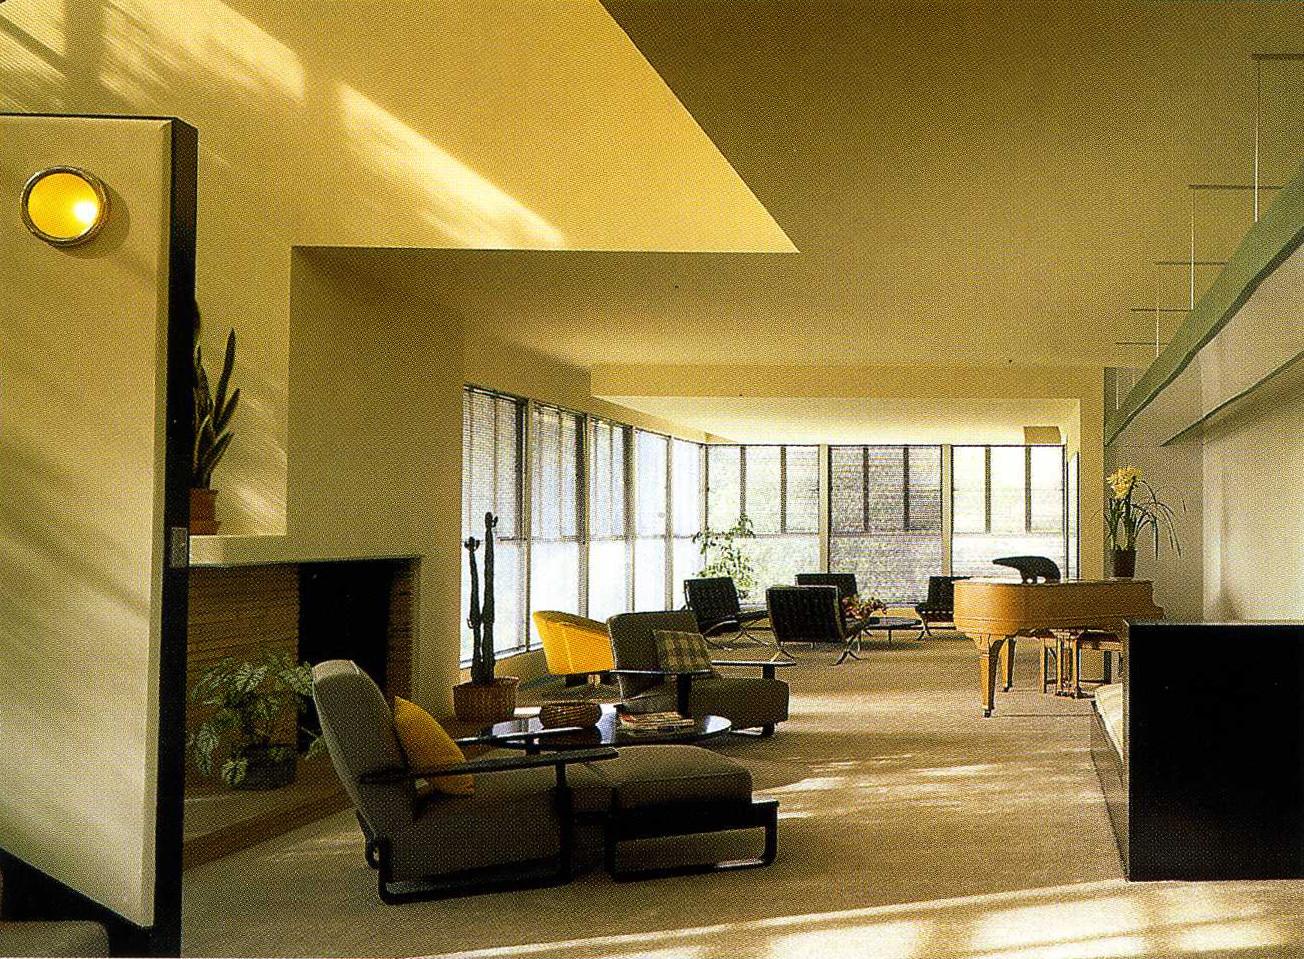 stringio House Plans Richard Neutra Los Angeles on achetecture los angeles, modern architecture los angeles, affluent neighborhoods in los angeles, design build los angeles, century the los angeles,